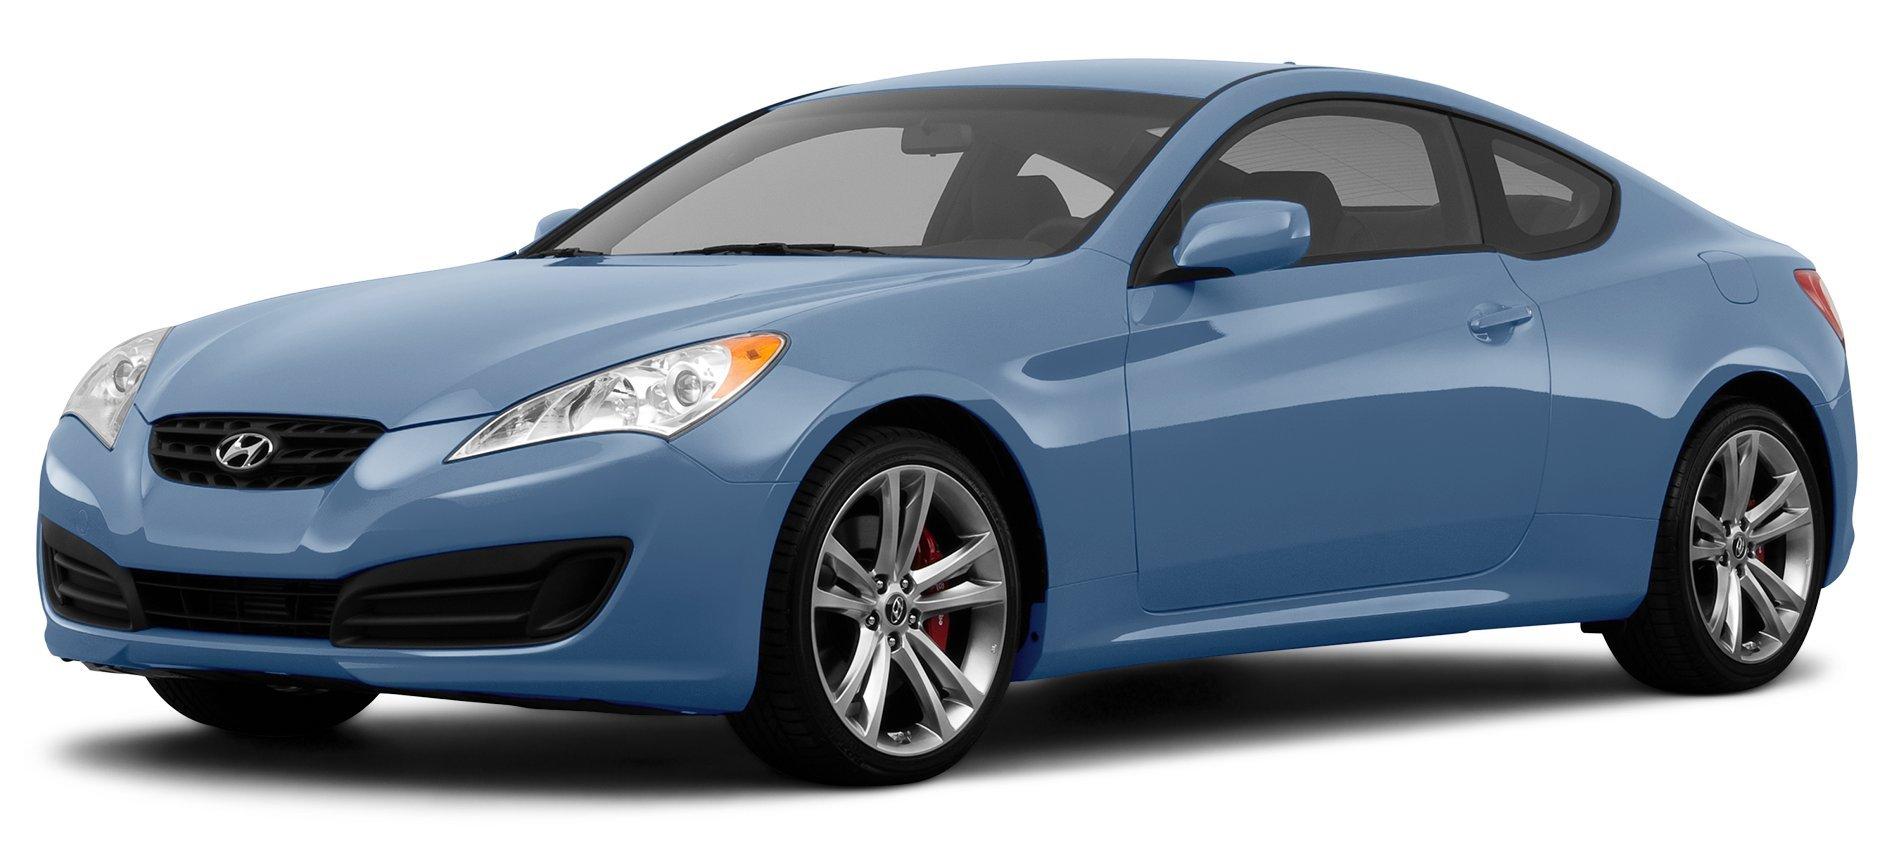 2012 Hyundai Genesis Coupe 2.0T, 2 Door 4 Cylinder Automatic Transmission  ...